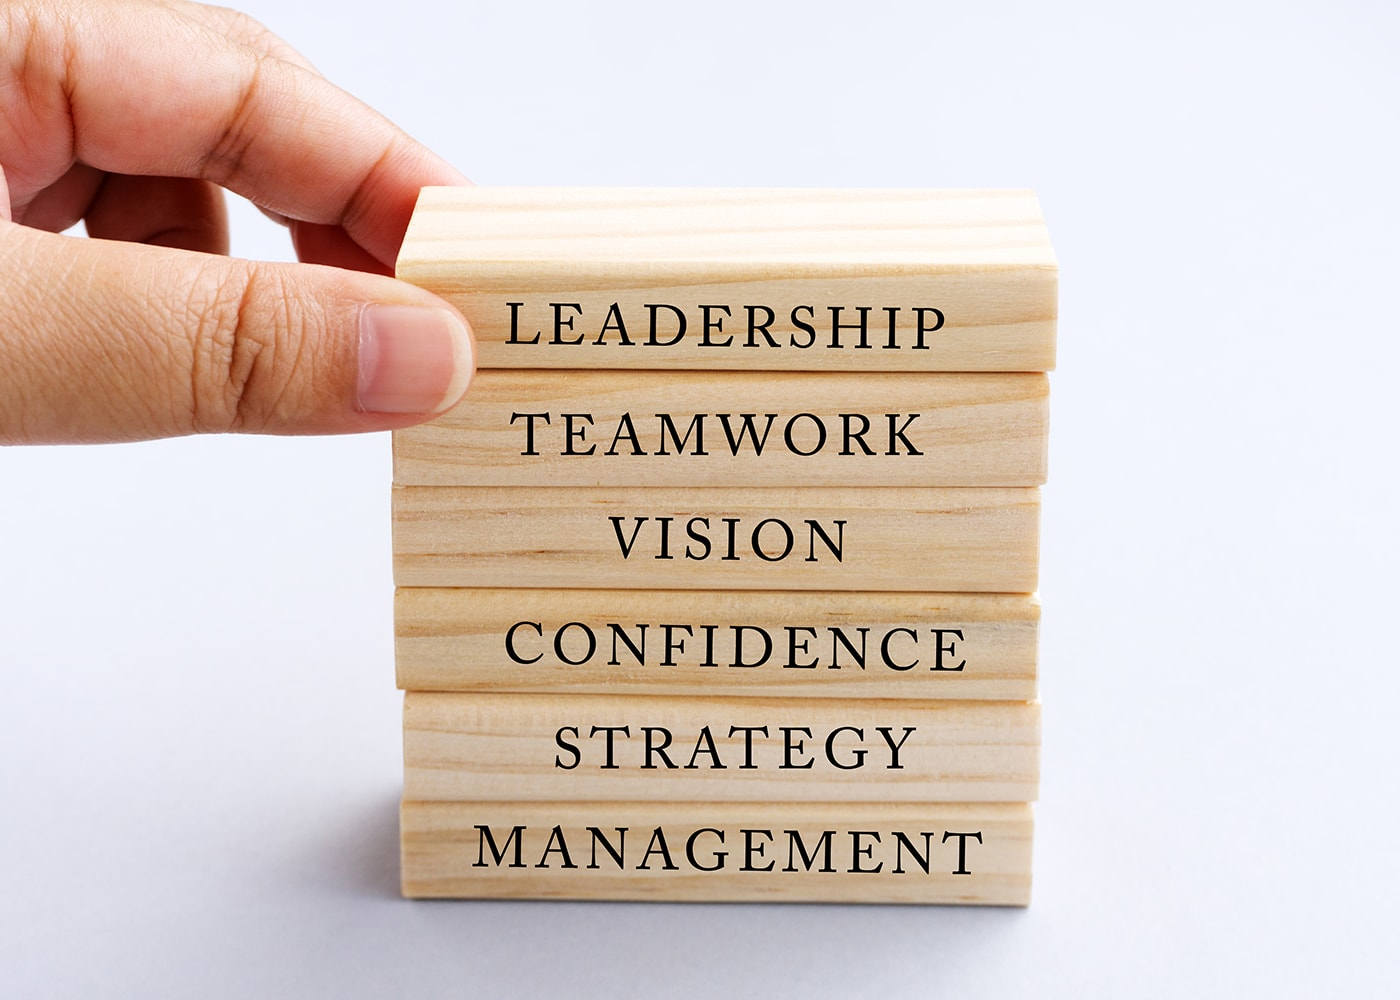 naem-2018-blog-hand-picking-wood-block-word-leadership-700x500